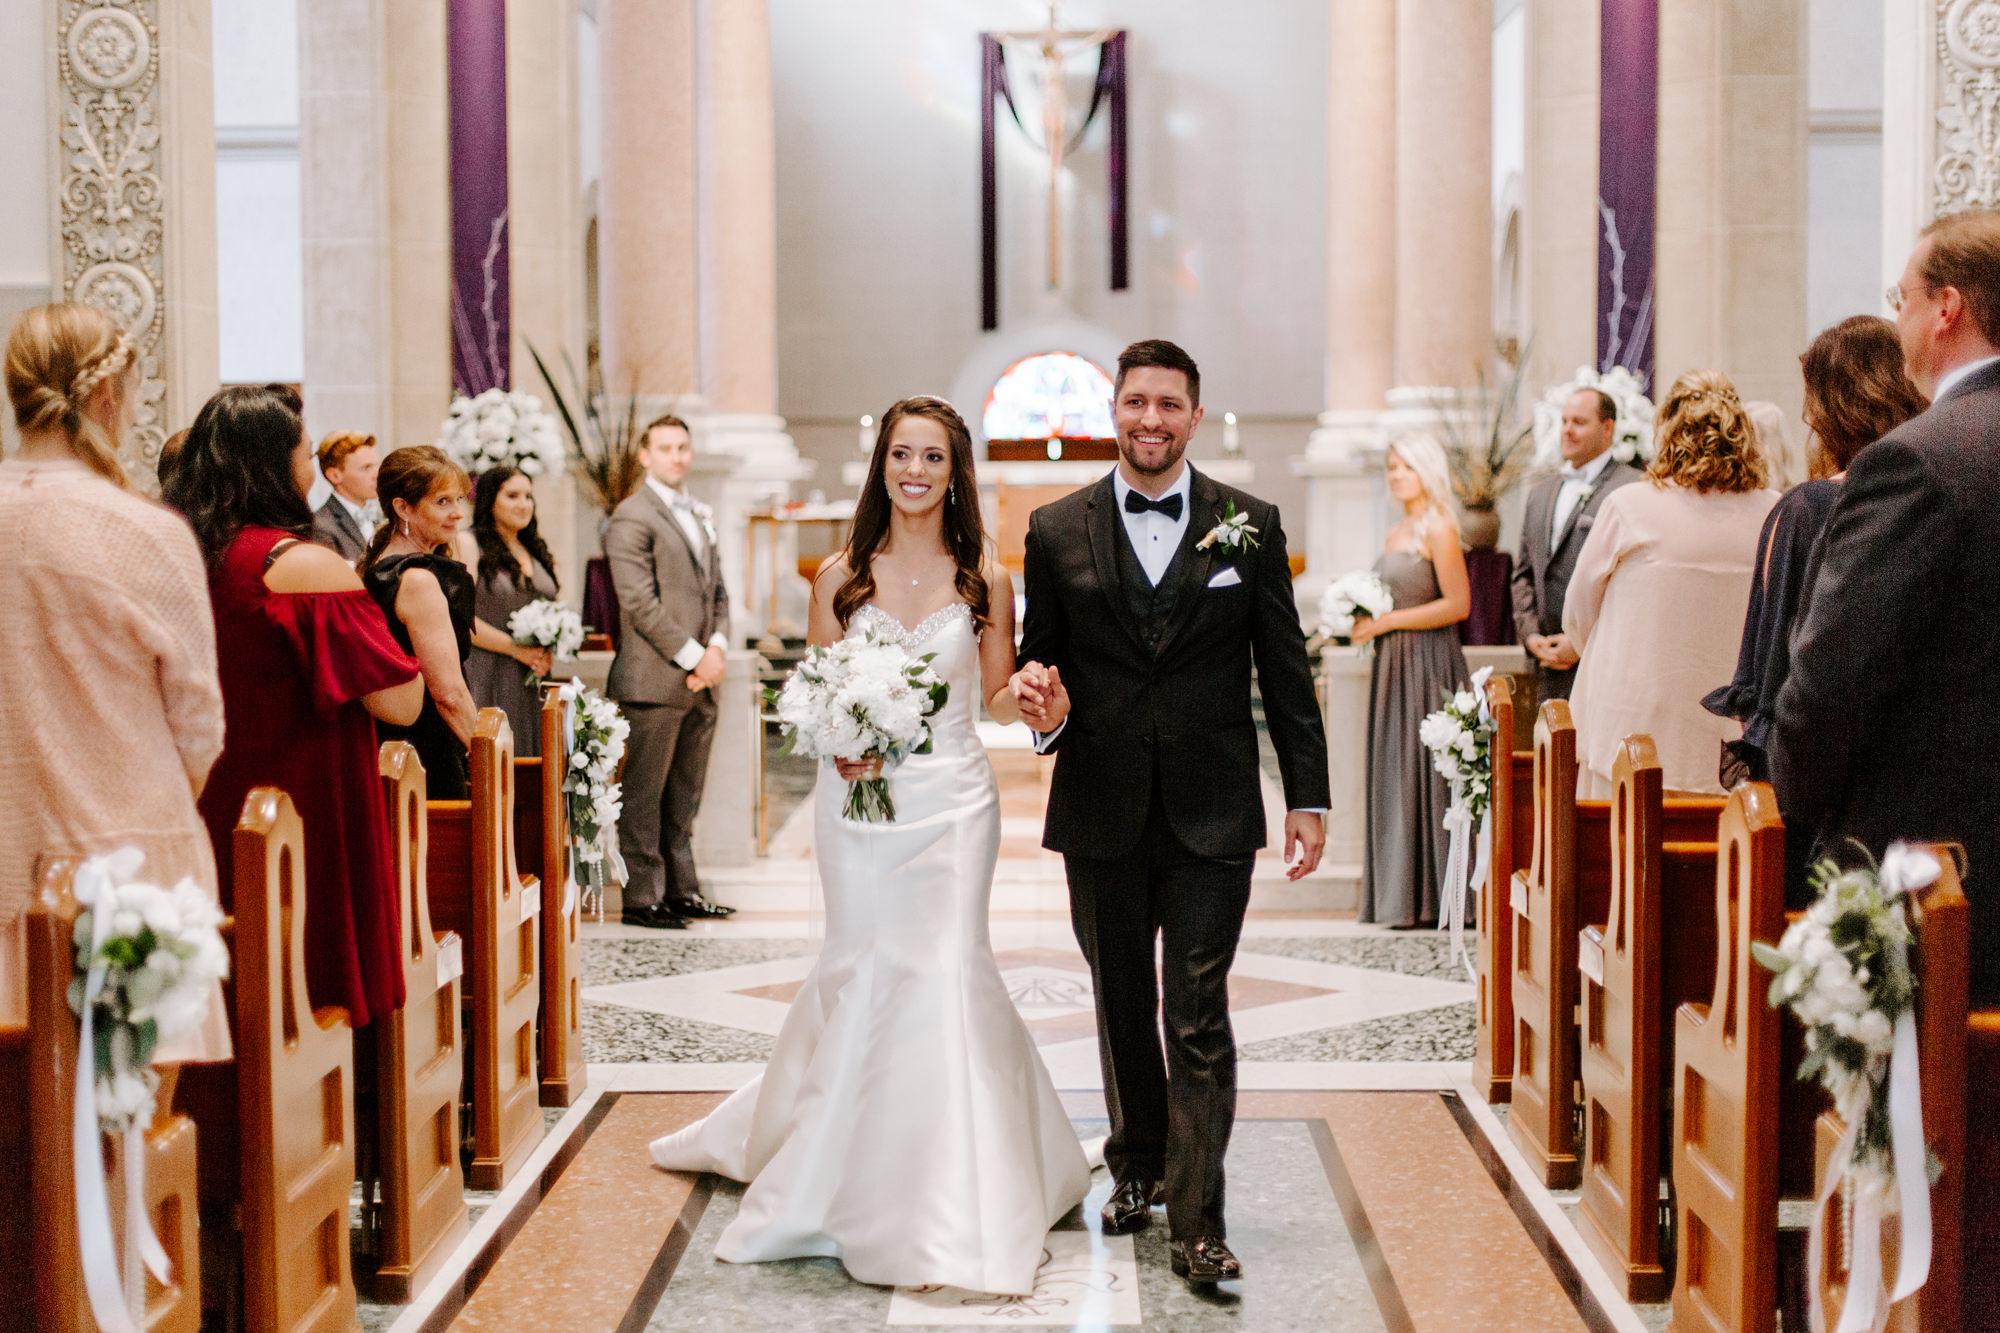 San Diego wedding photography at USD Immaculata 031.jpg